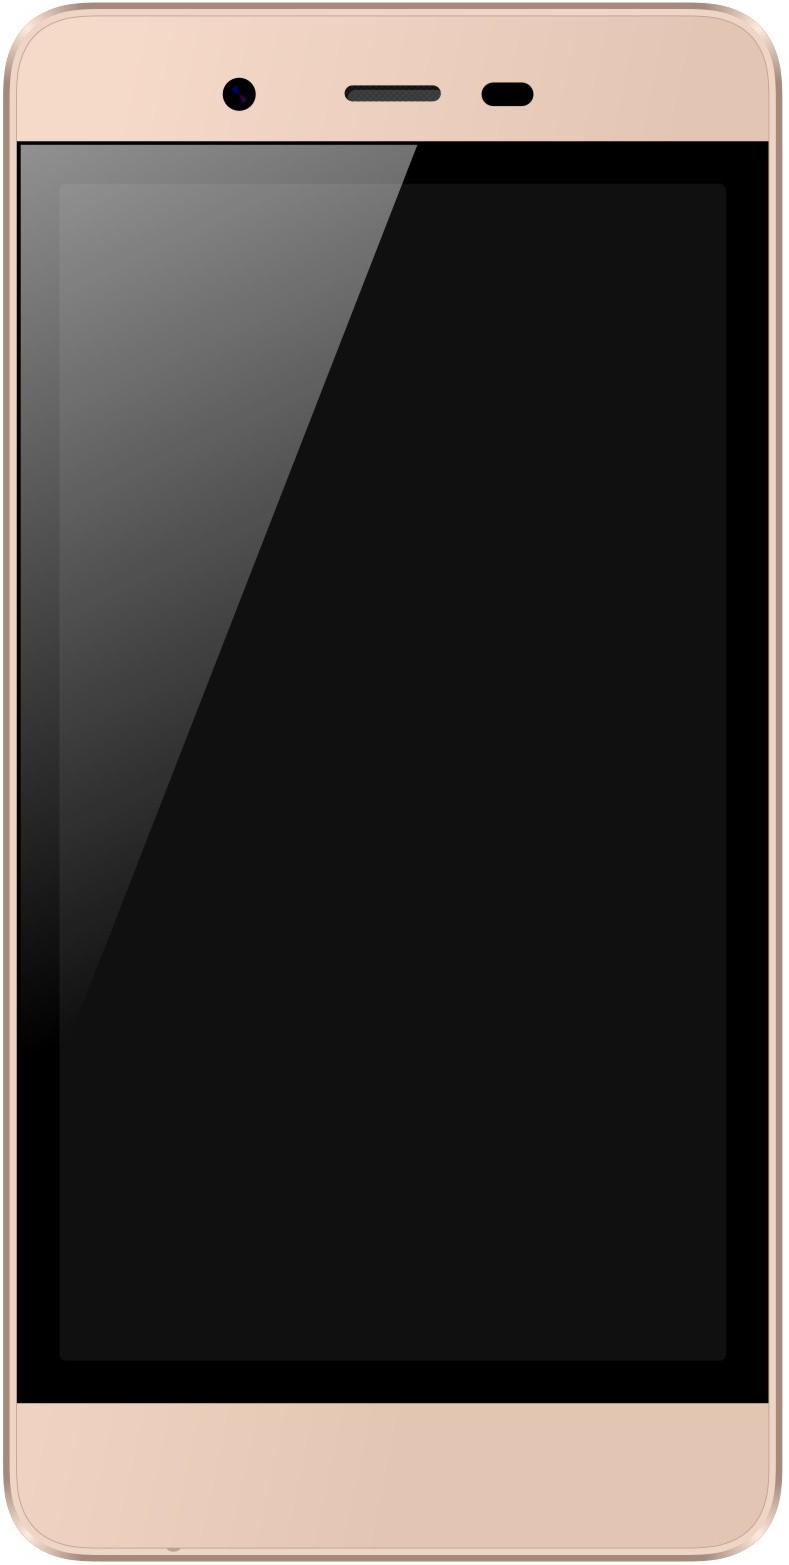 Micromax Vdeo 2 (1GB RAM, 8GB)